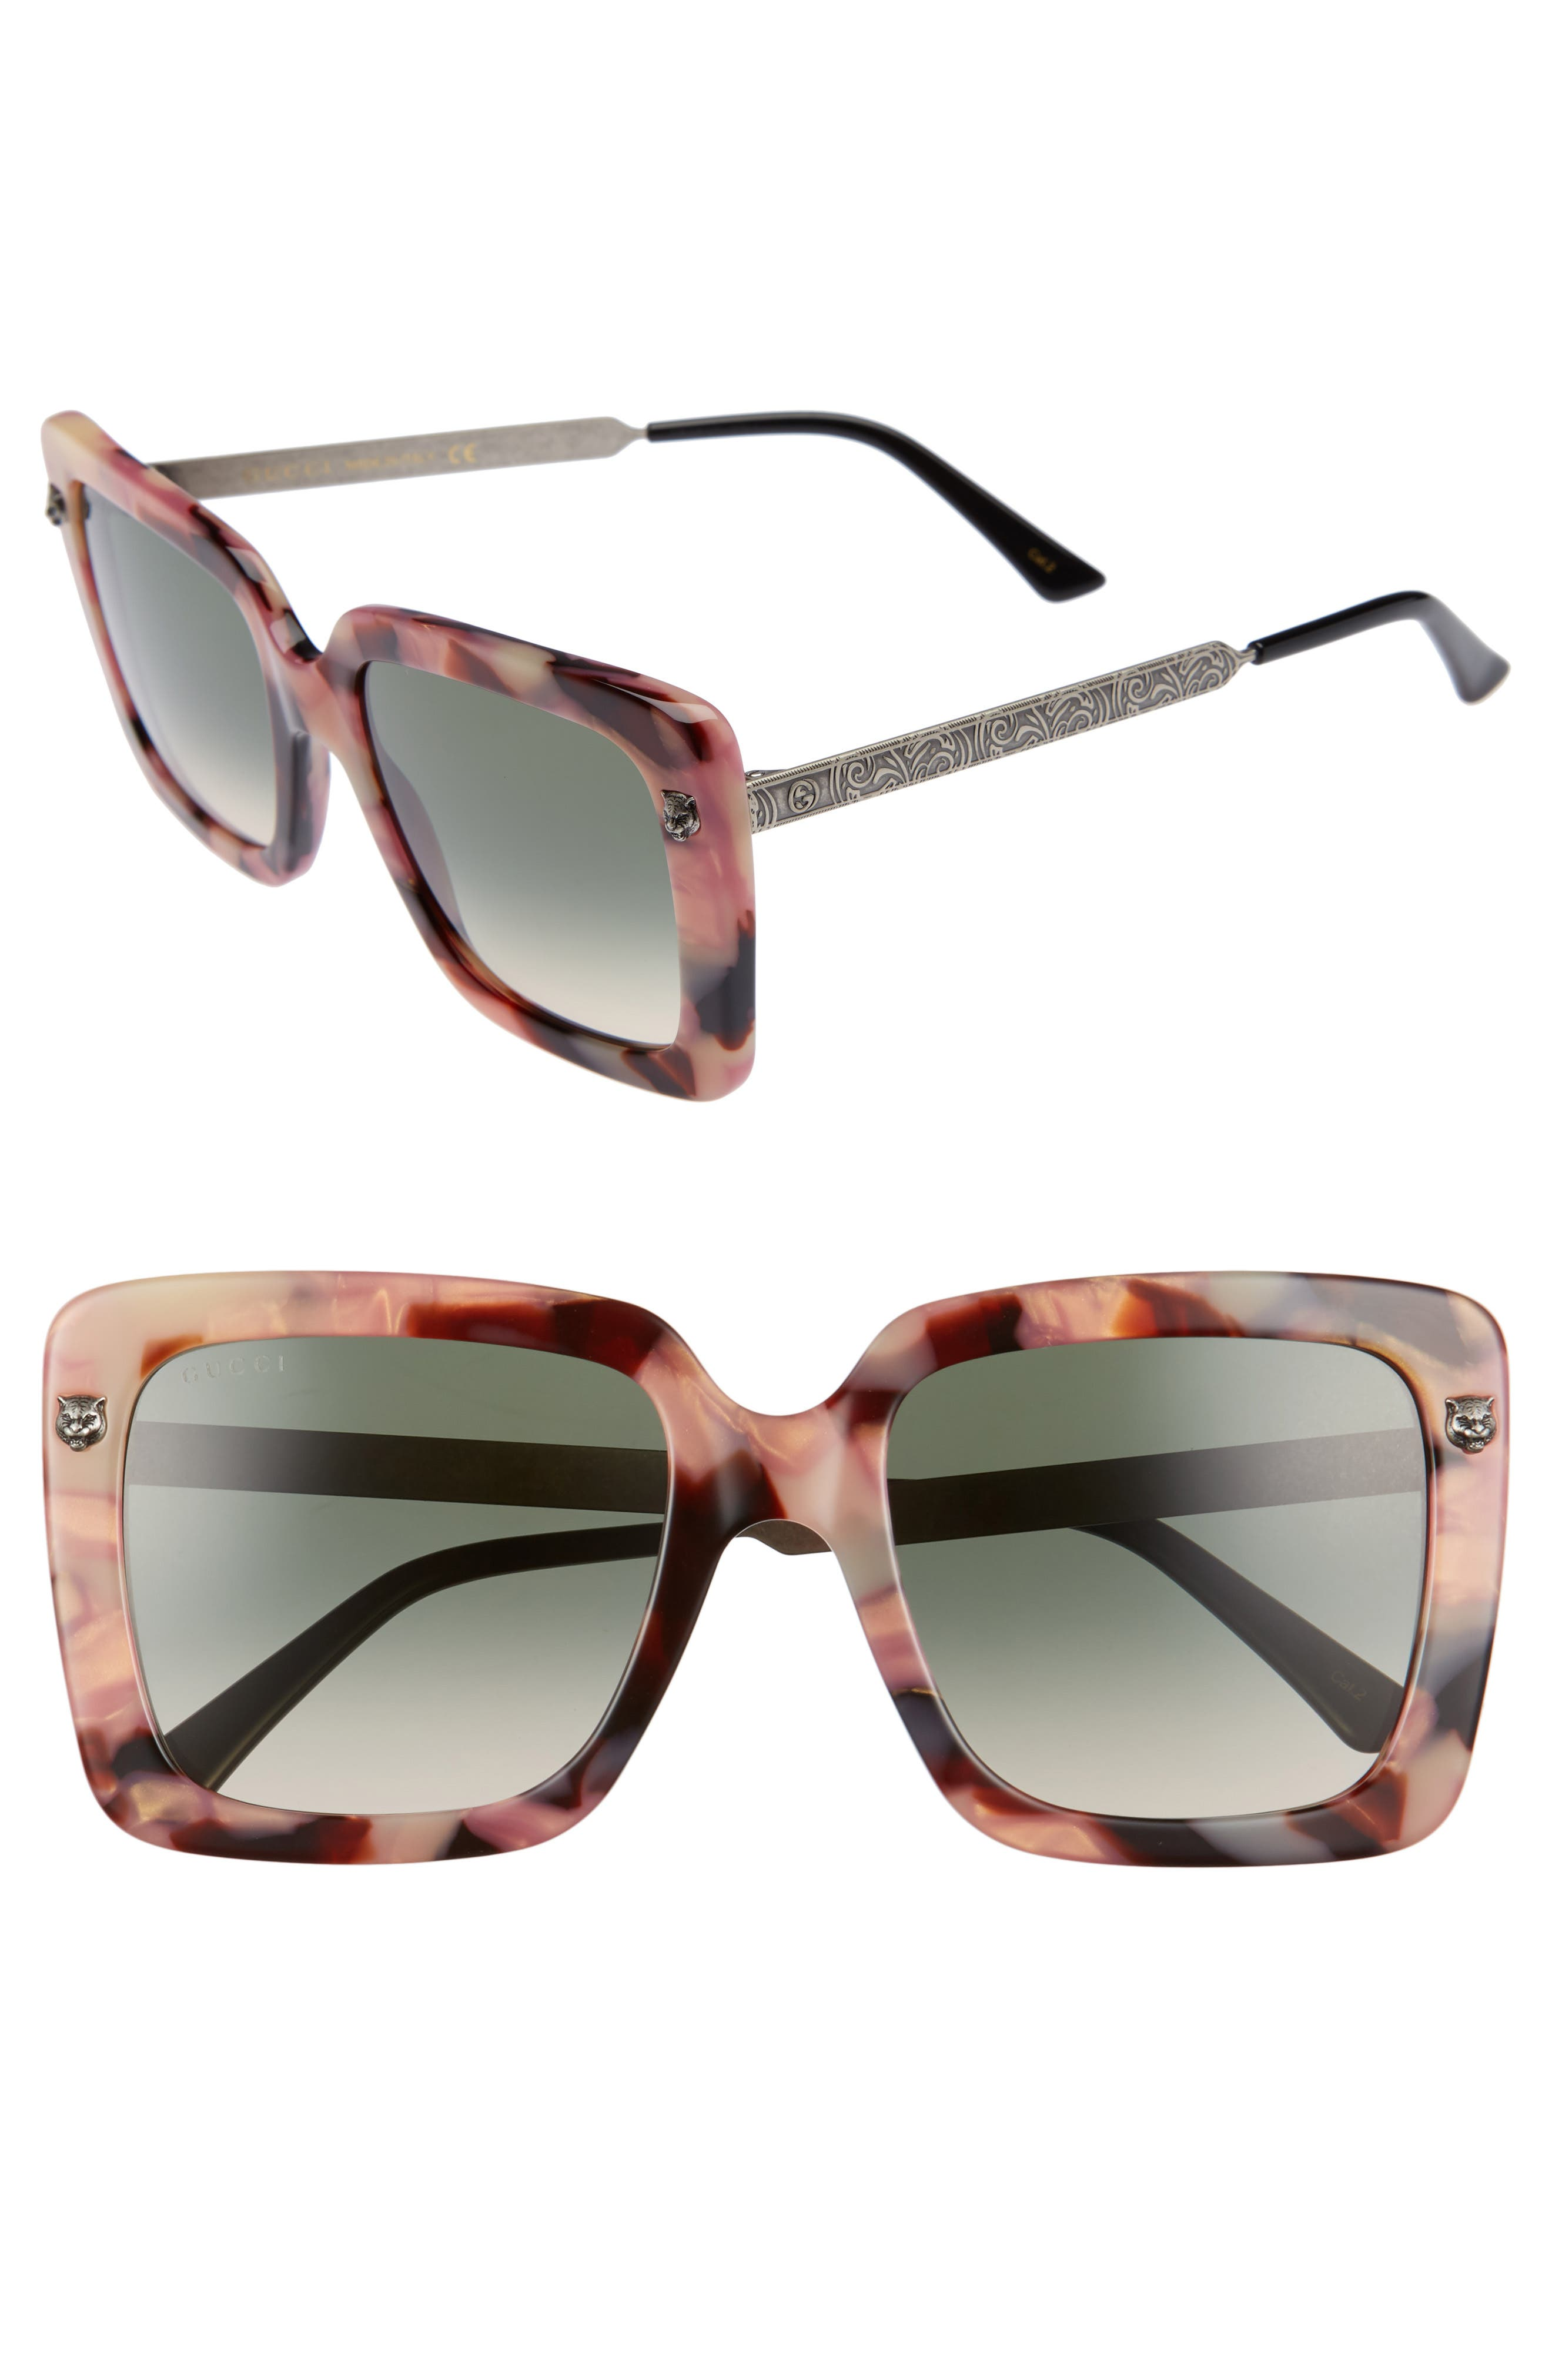 53mm Square Sunglasses,                             Main thumbnail 1, color,                             Havana